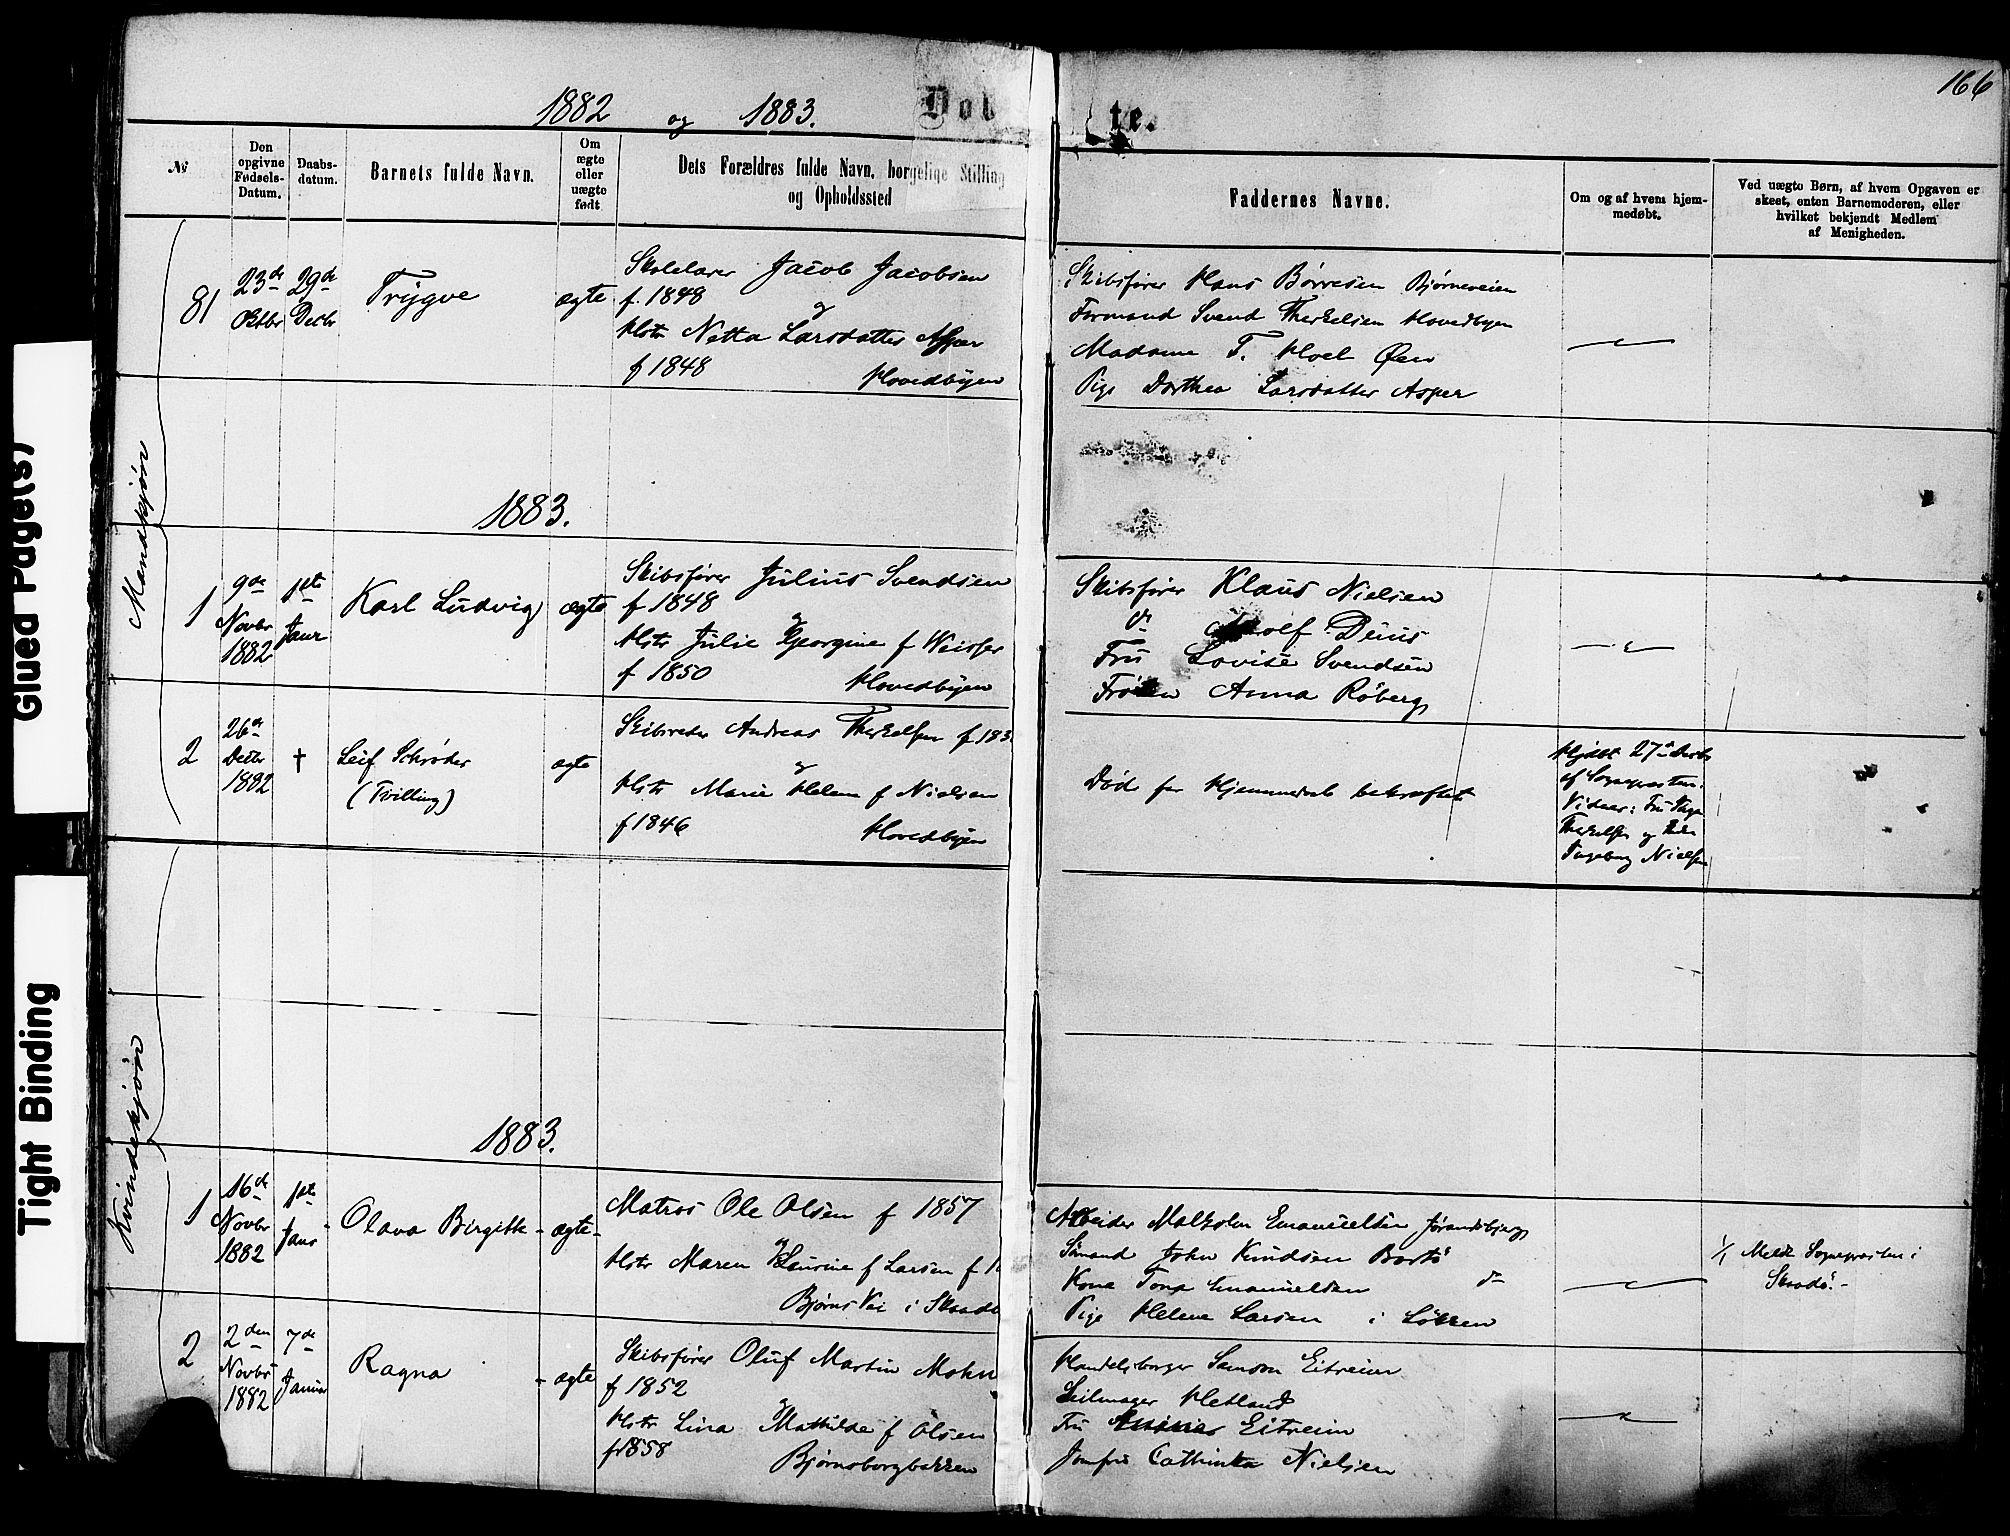 SAKO, Kragerø kirkebøker, F/Fa/L0011: Ministerialbok nr. 11, 1875-1886, s. 166